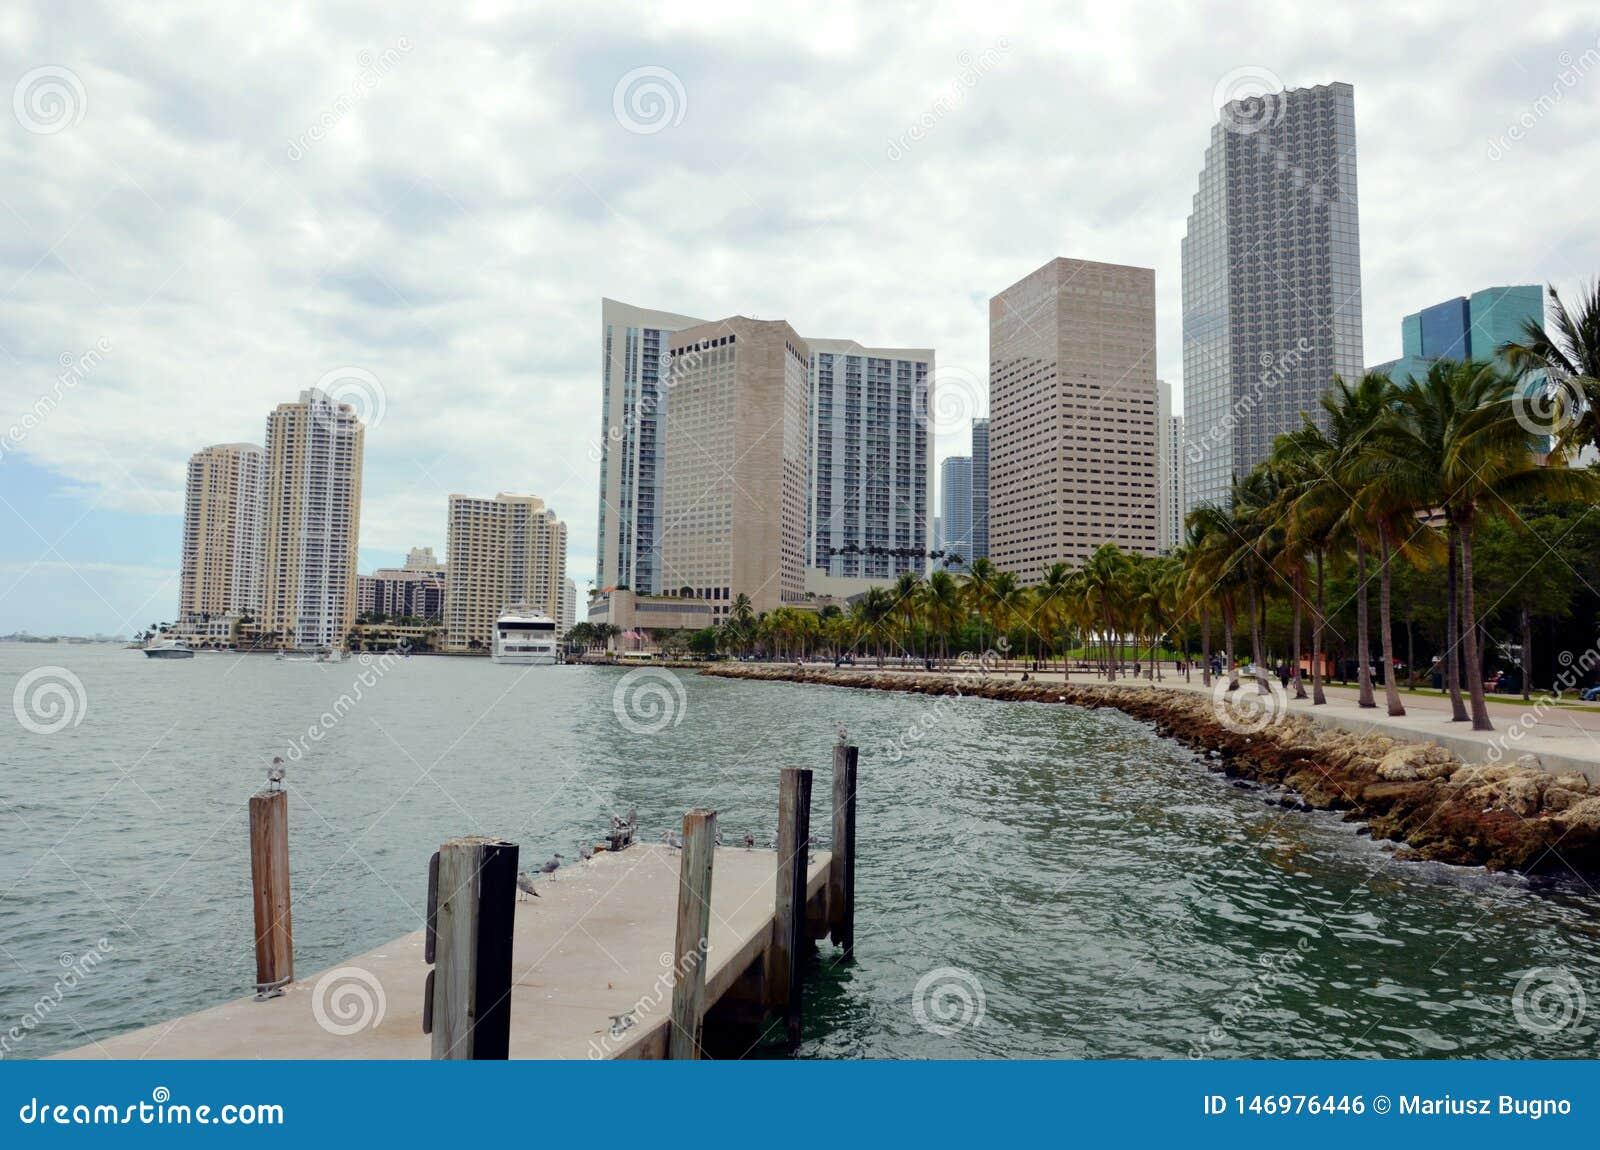 Modern buildings in Miami, Florida